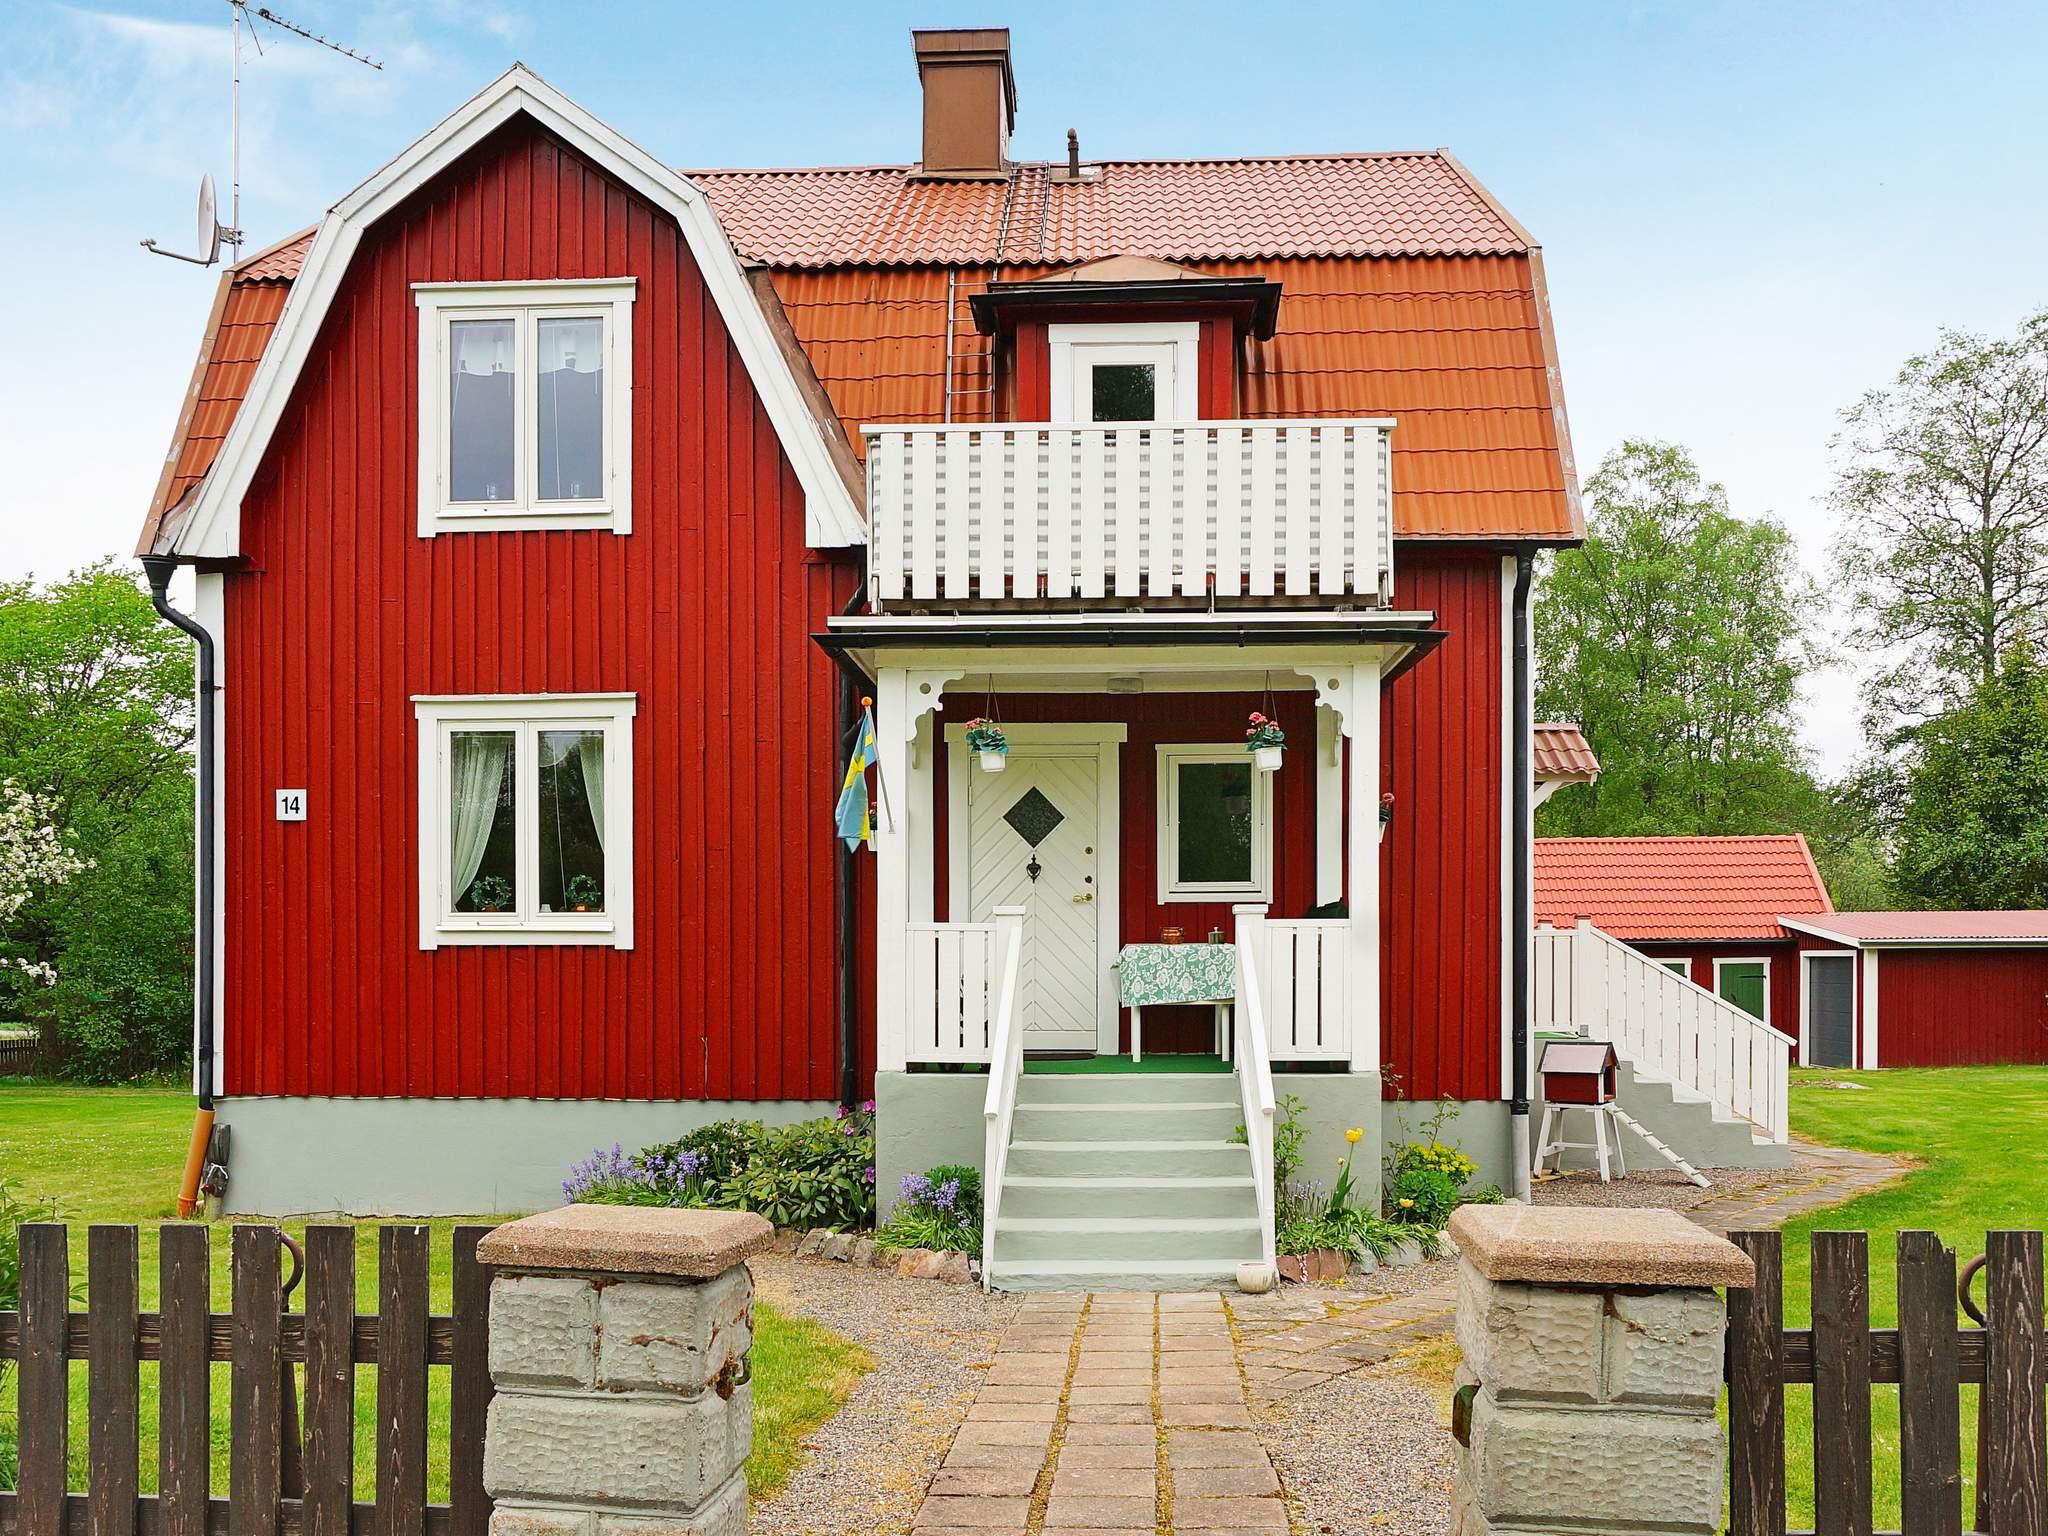 Ferienhaus Sandsjöfors (418764), Sandsjöfors, Jönköpings län, Südschweden, Schweden, Bild 18